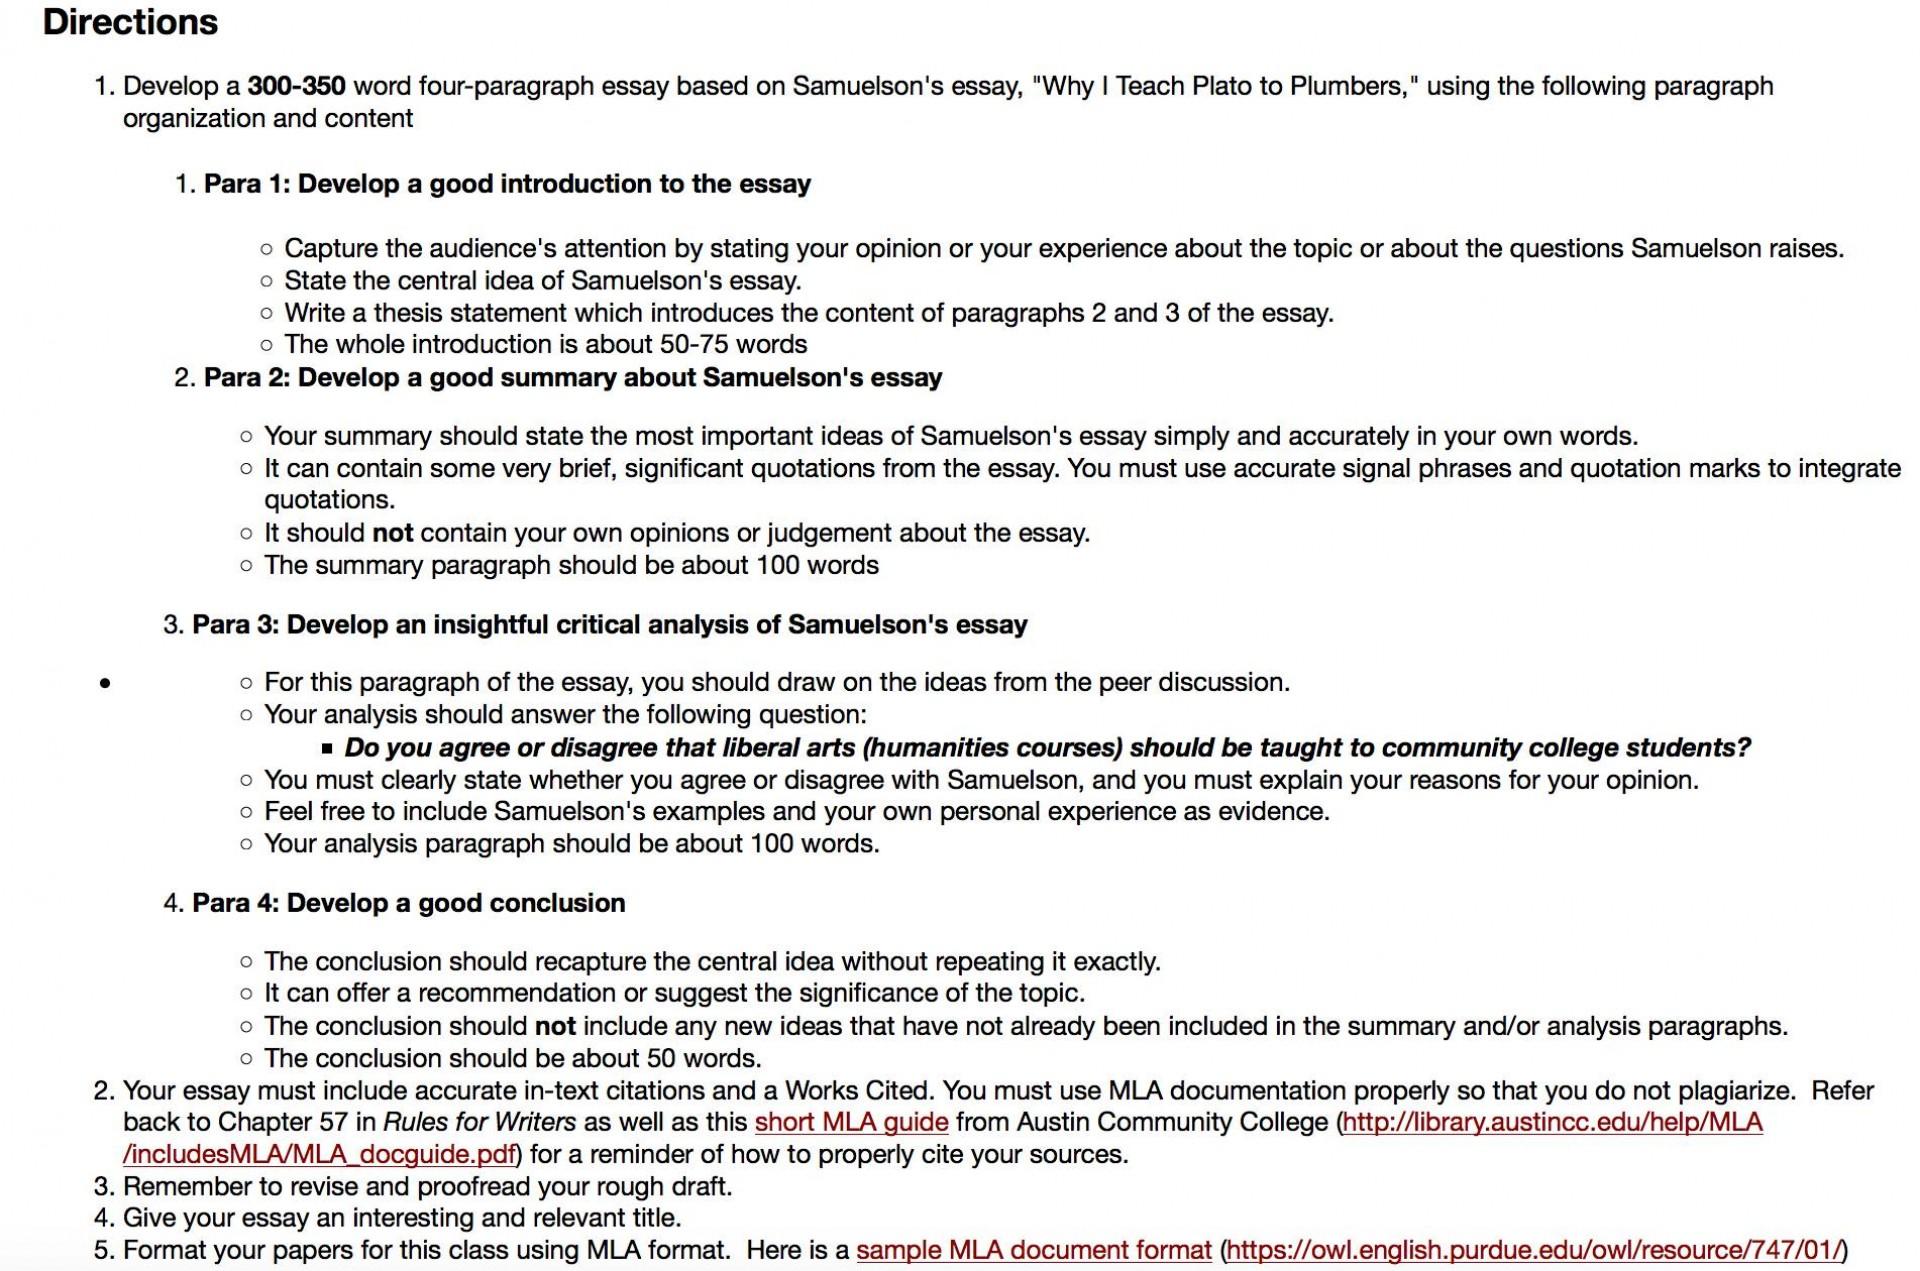 008 Essay Example Word 13446206 10210066177277870 1683047516 O Sensational 100 On Leadership Topics 1920